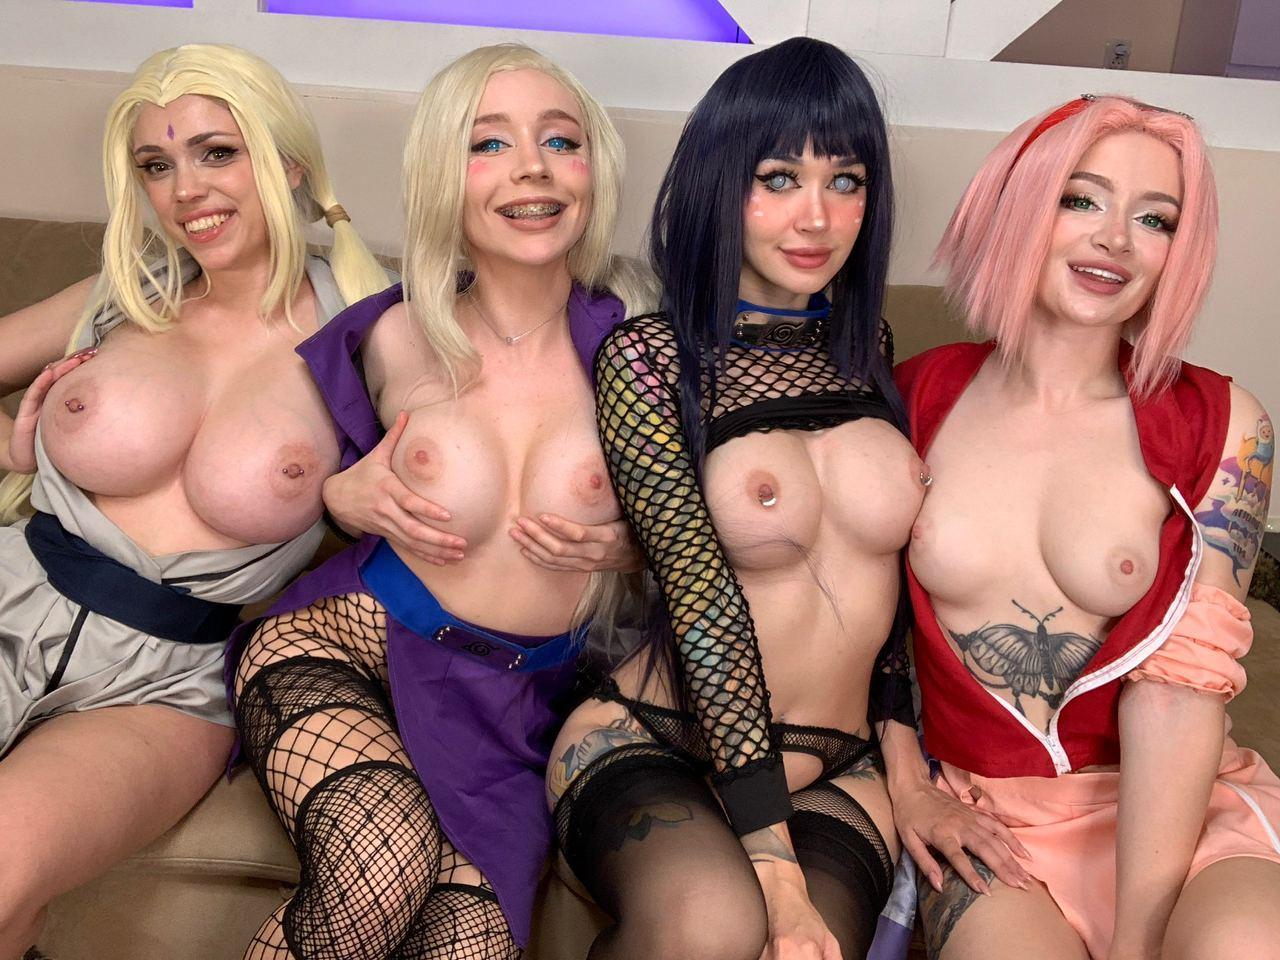 Tsunade, Ino, Hinata And Sakura From Naruto By Octokuro, Alice Bong, Purple Bitch And Leah Meow